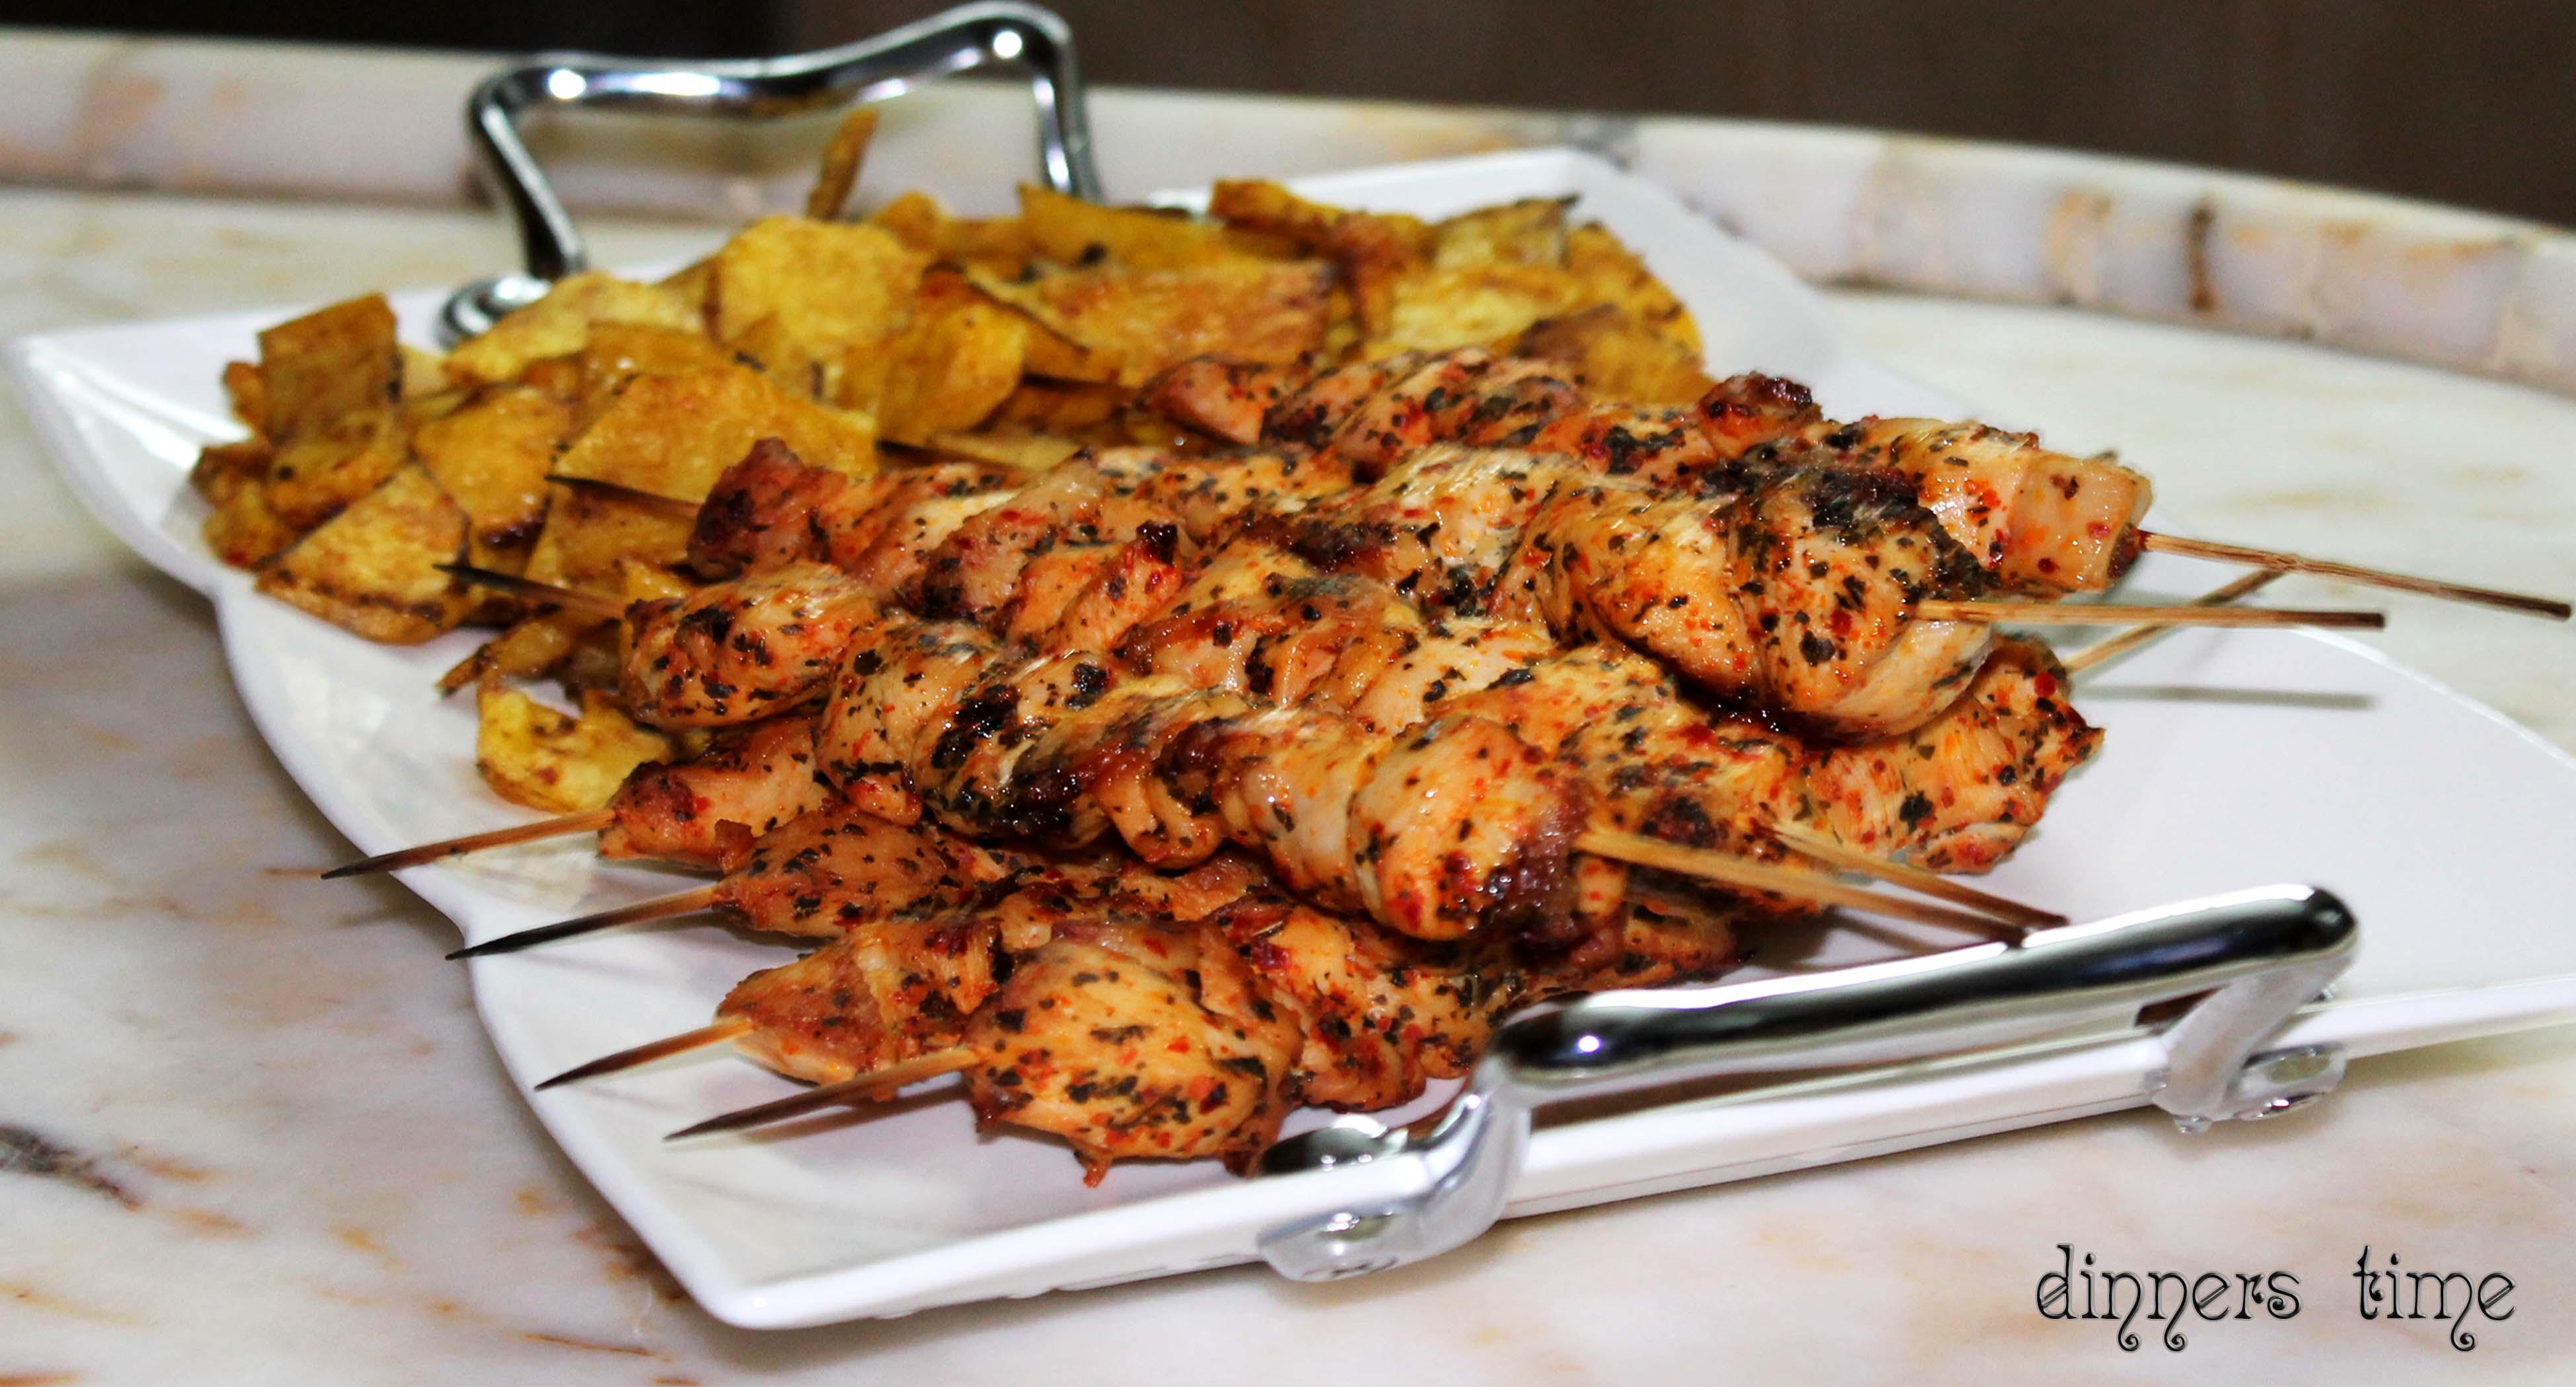 Fırında Patatesli Tavuk Şiş Tarifi Videosu